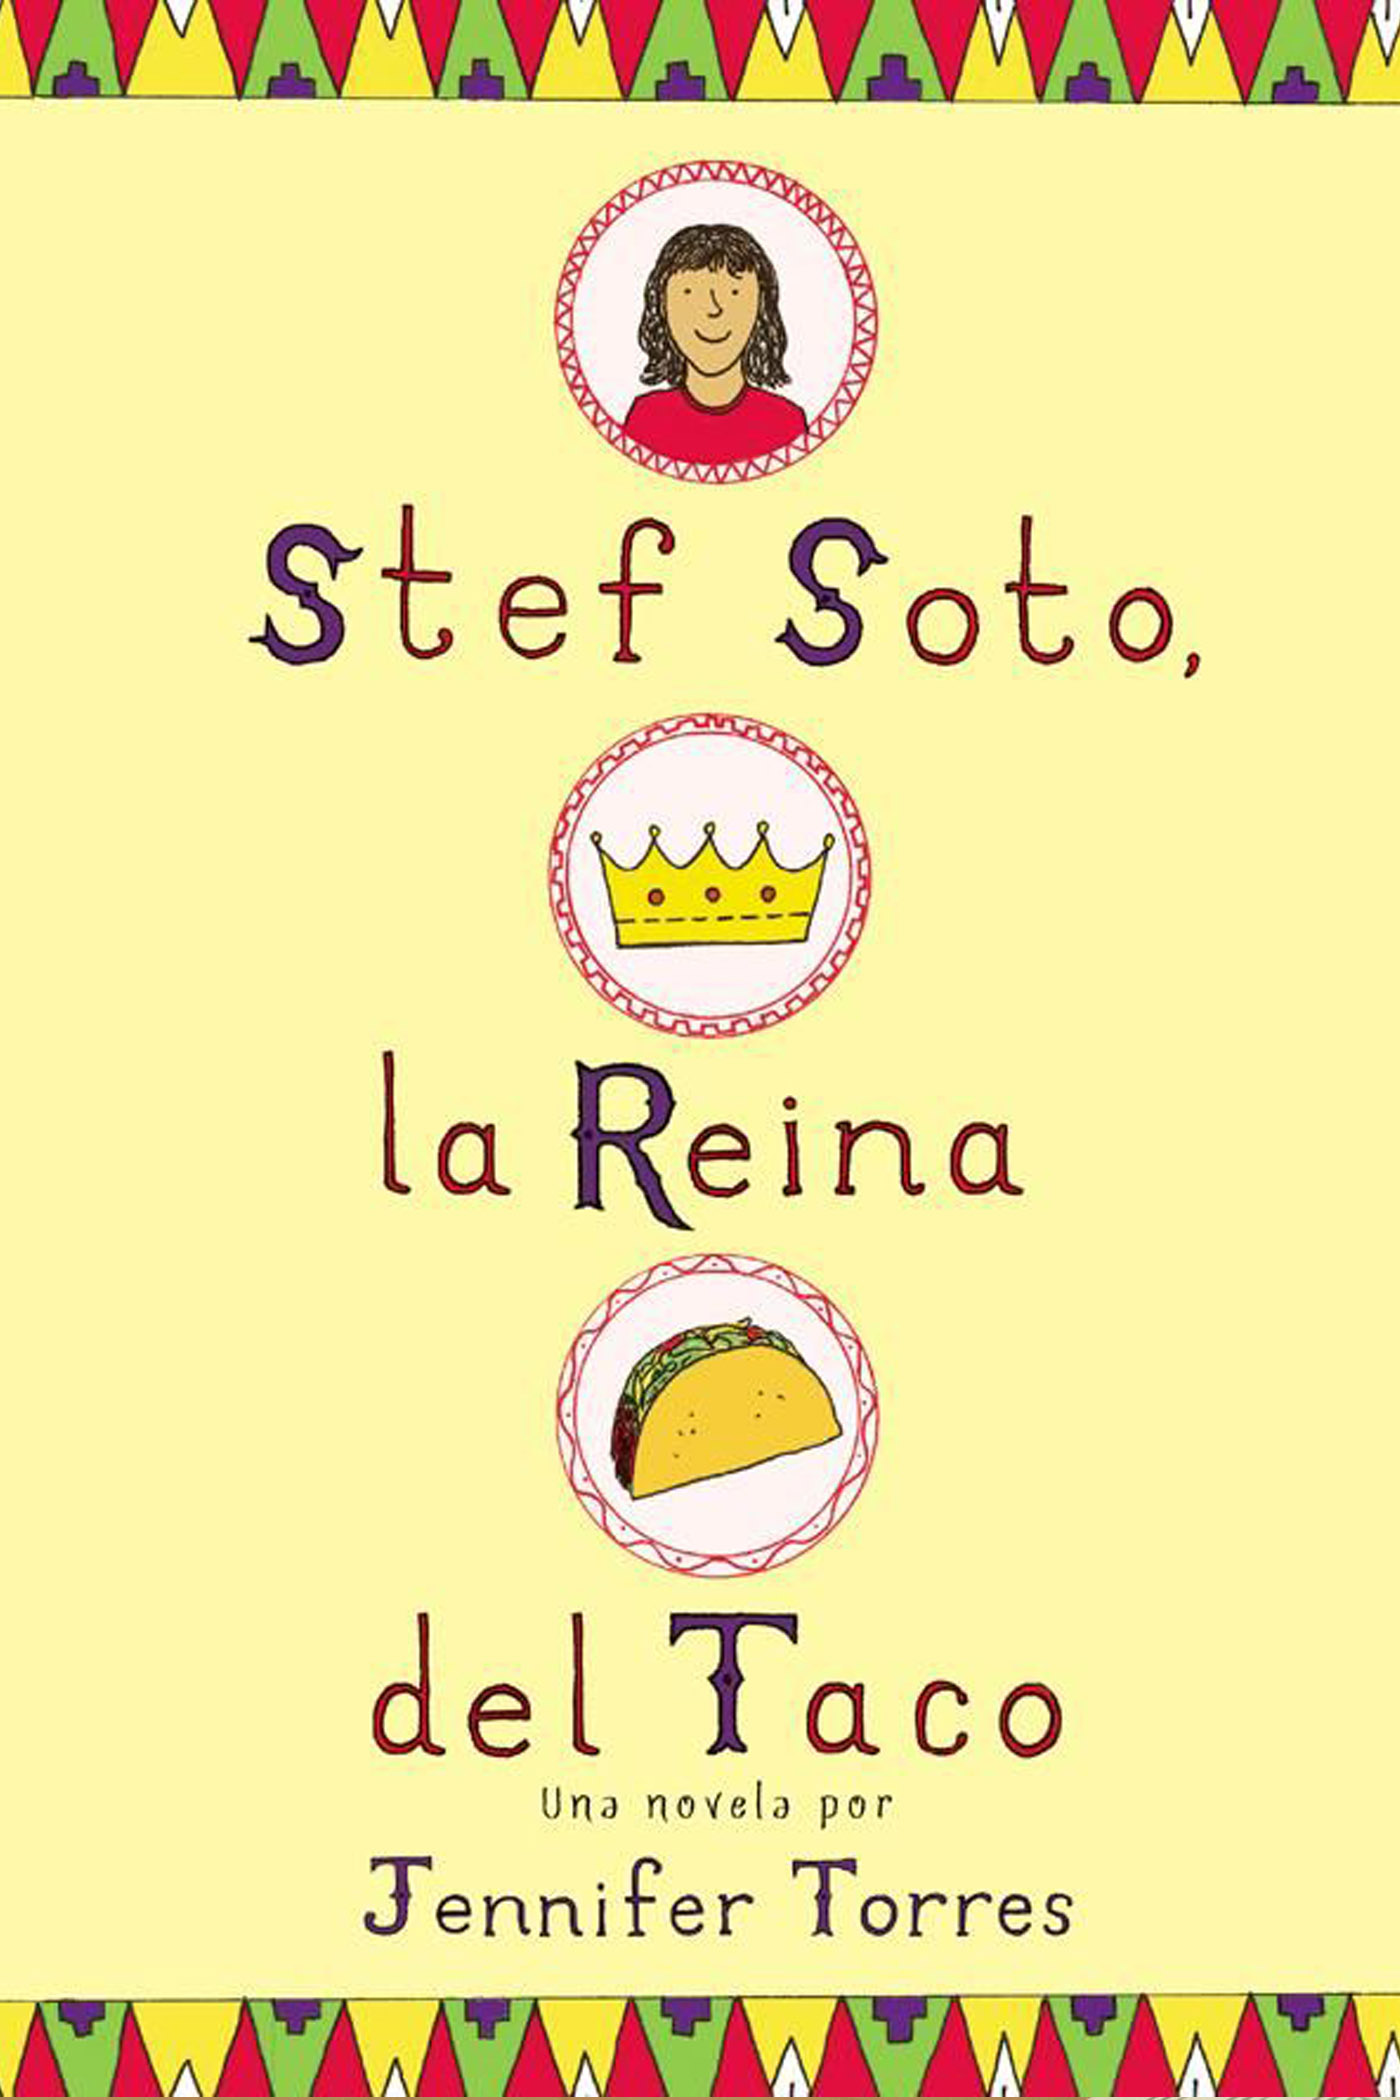 Stef Soto, la Reina del Taco b y Jennifer Torress